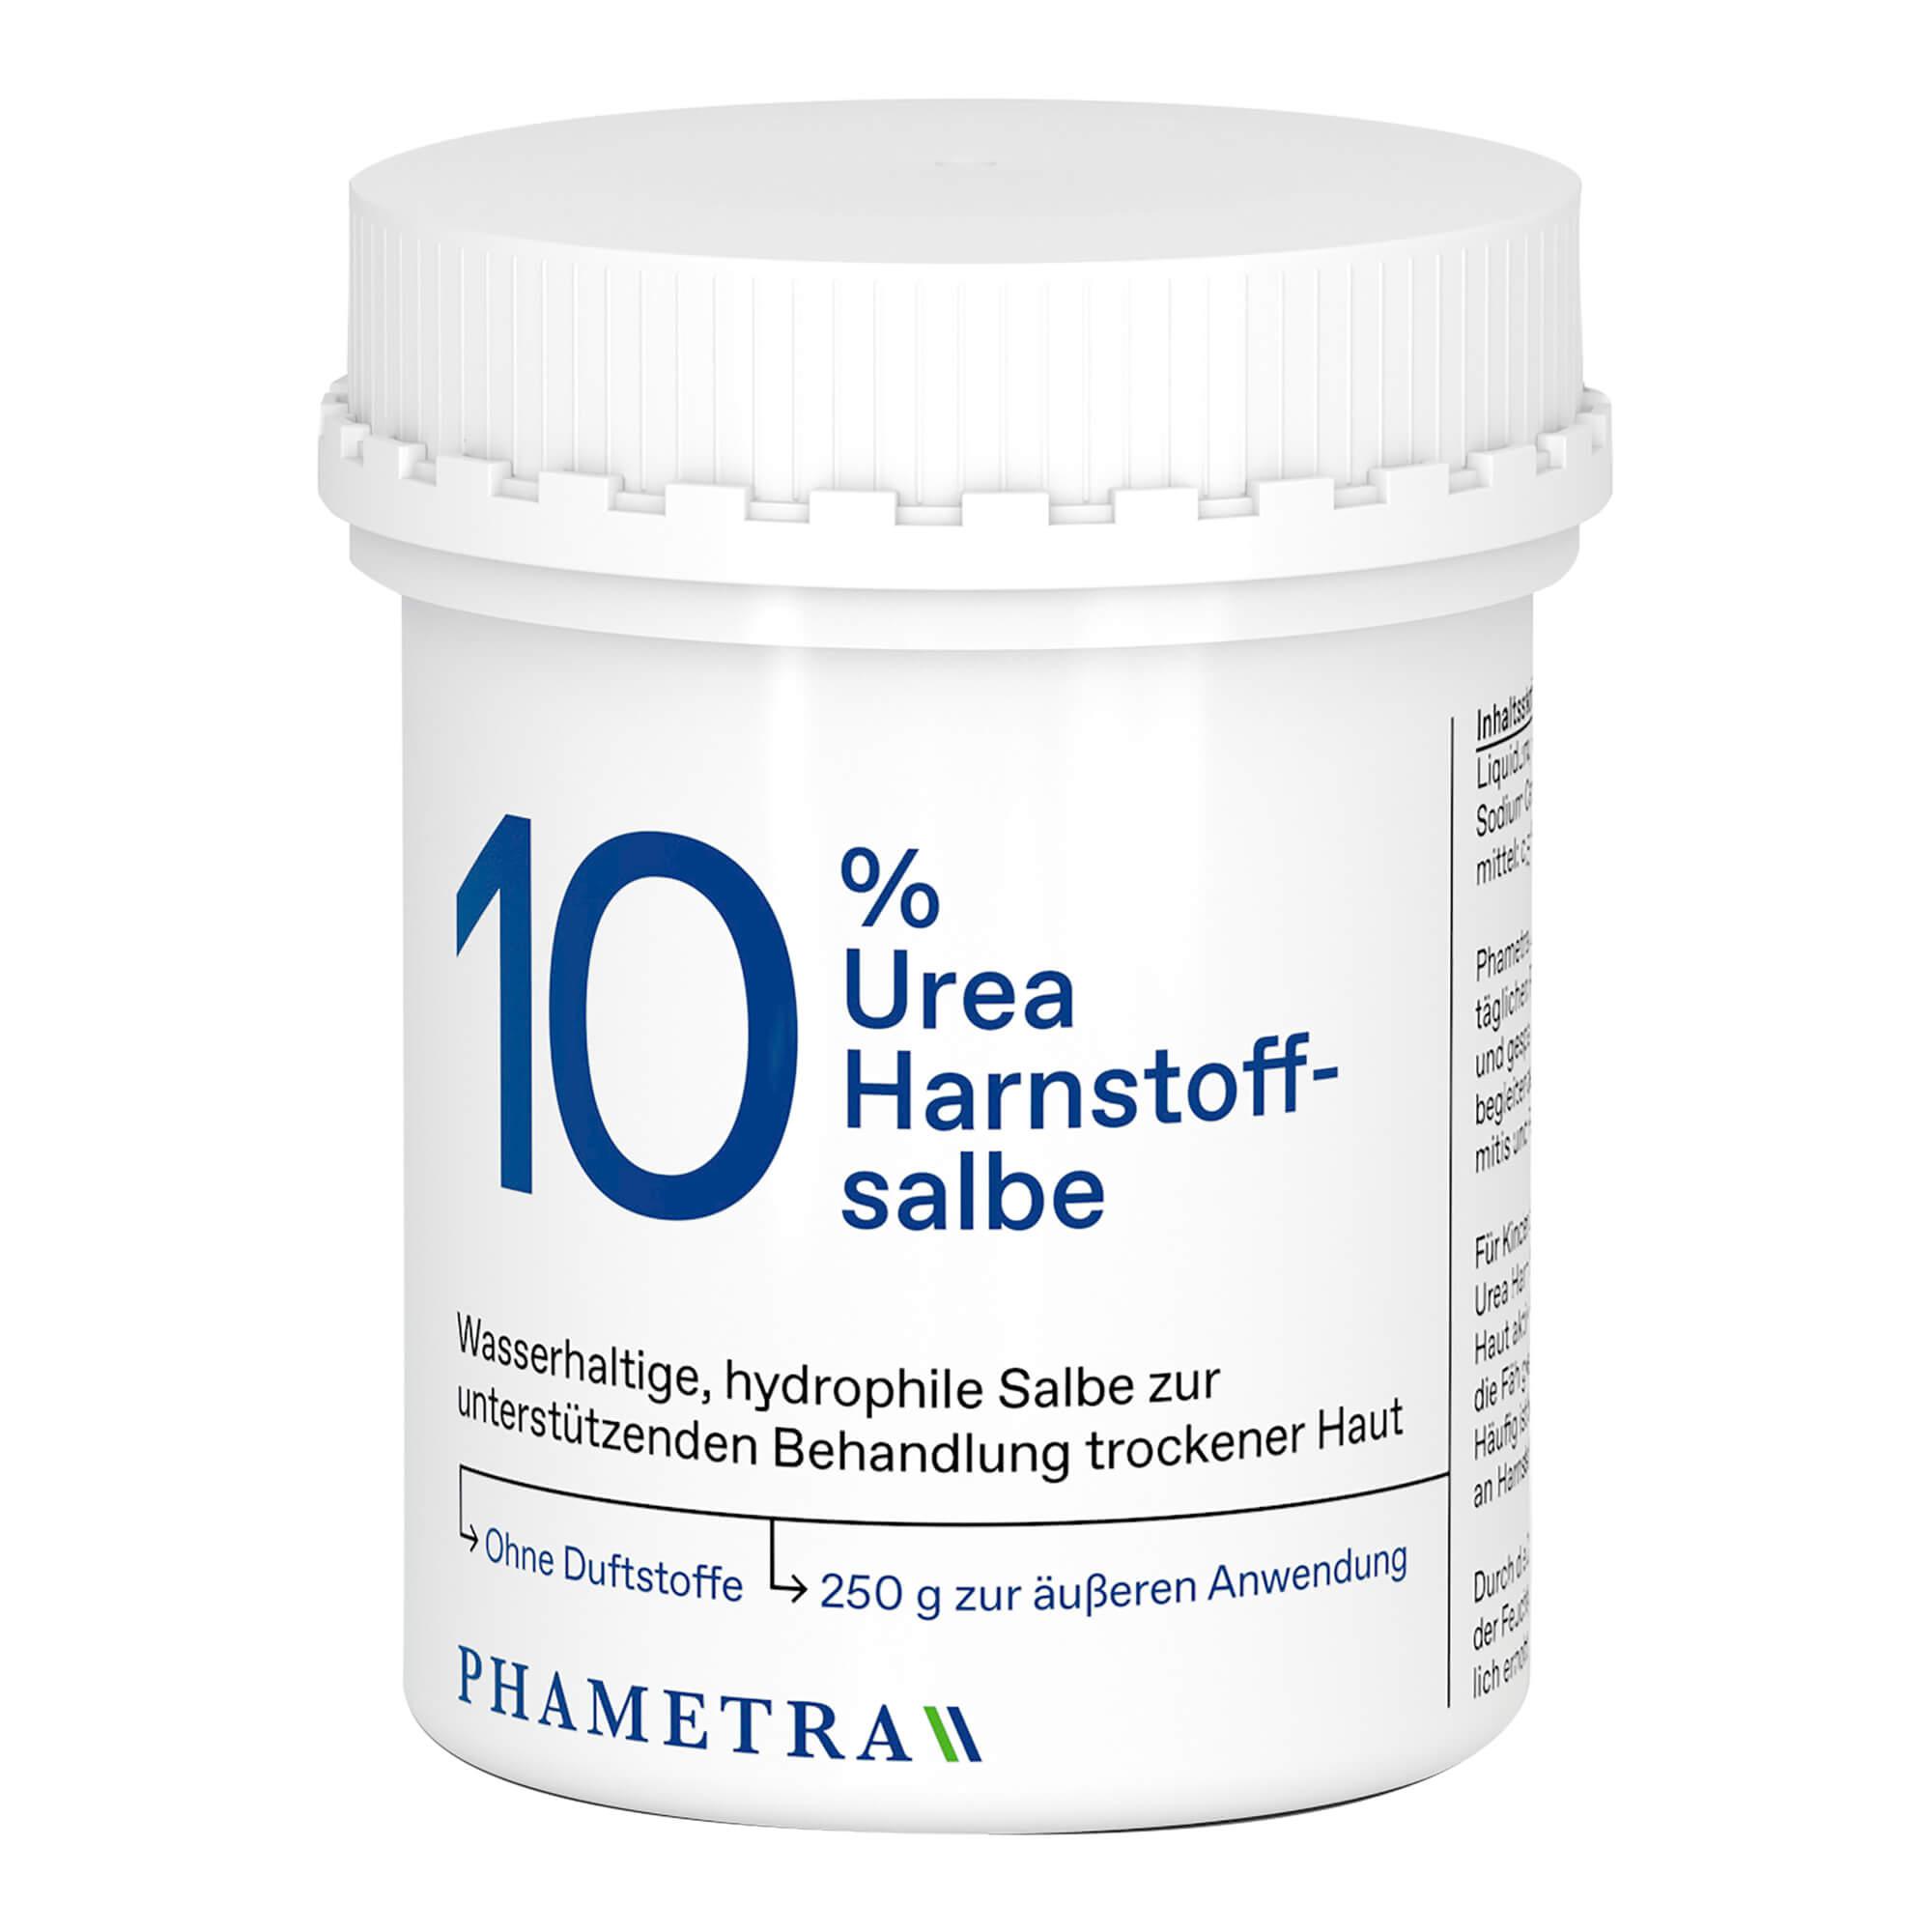 10 % Urea-Harnstoffsalbe